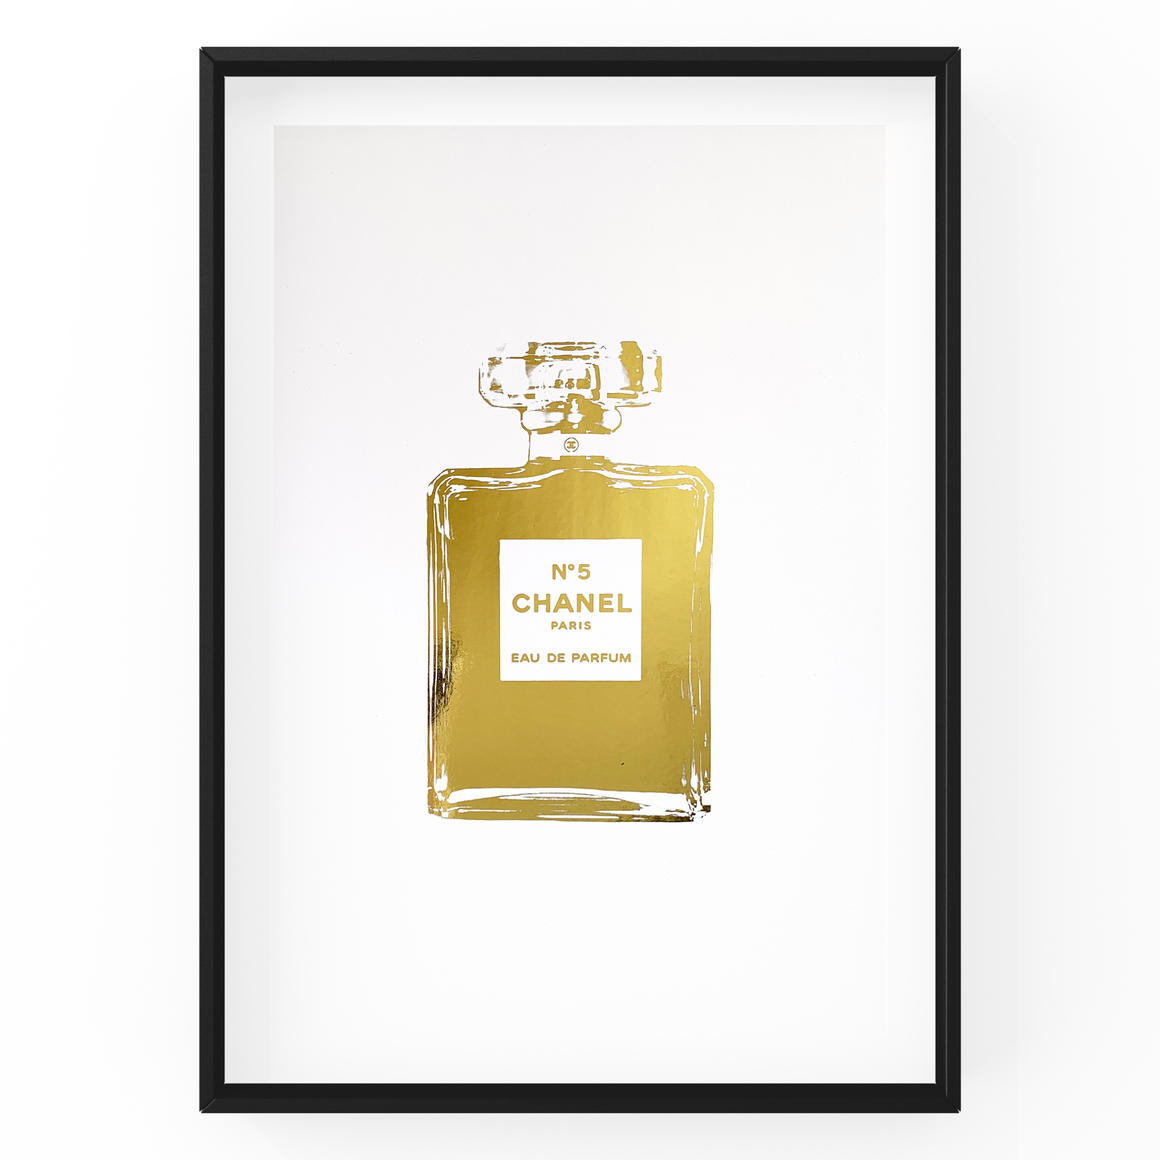 Chanel No5 Perfume Bottle | Trada Marketplace